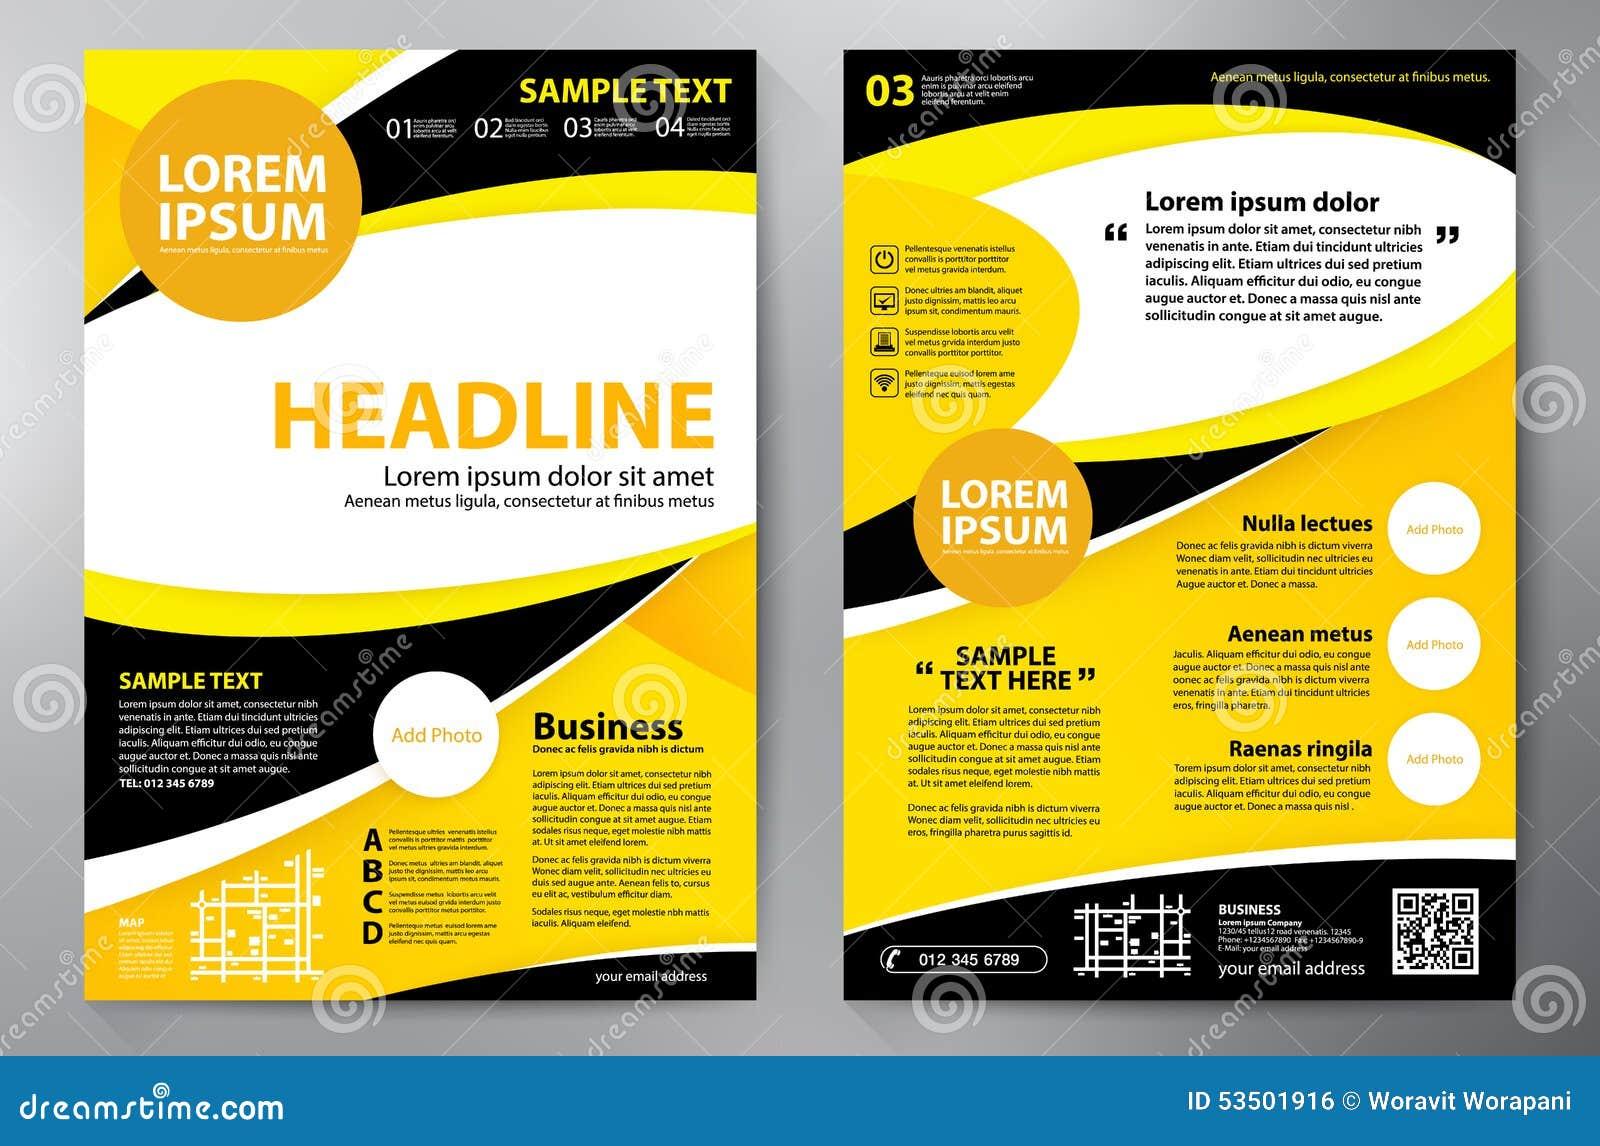 a4 brochure template - brochure design a4 template stock illustration image